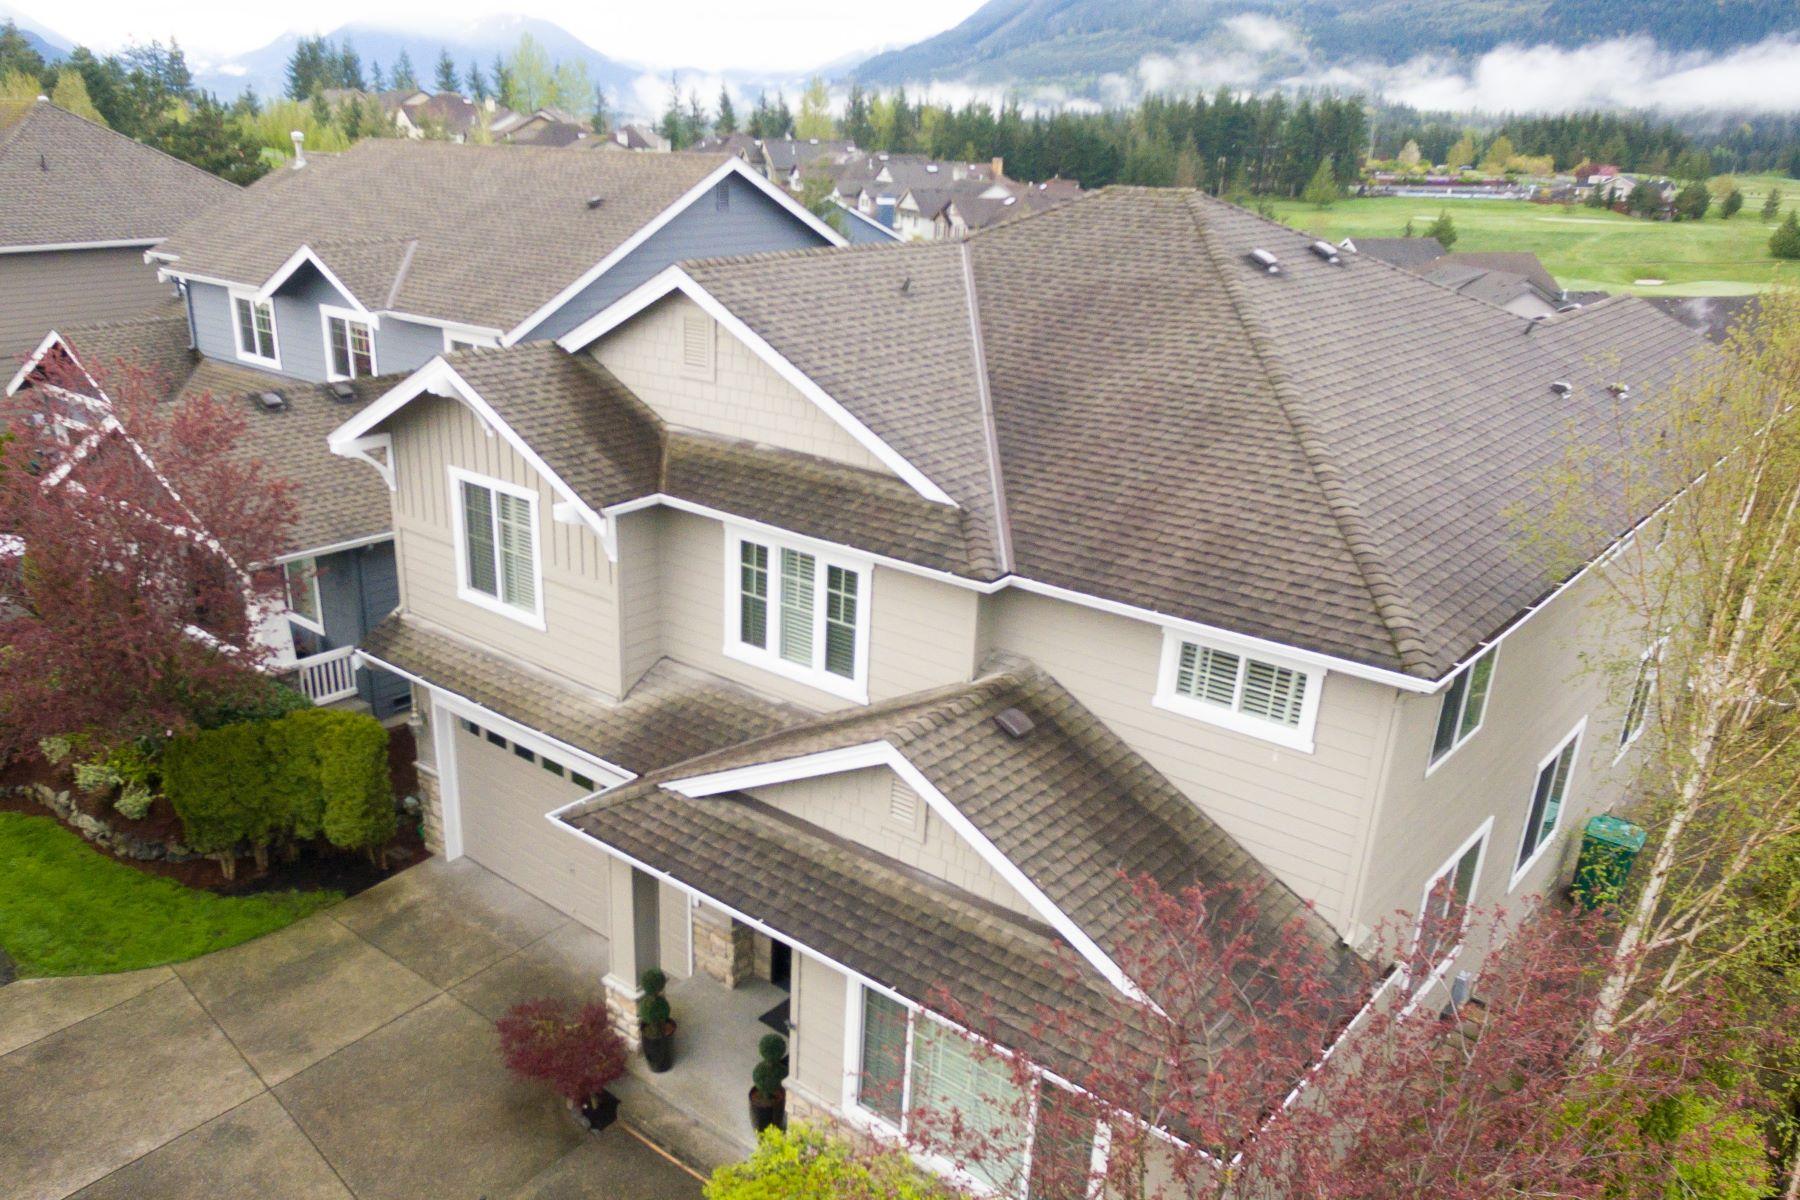 Single Family Home for Sale at Tranquil Snoqualmie Ridge Property 35903 SE Kaleetan Loop Snoqualmie, Washington, 98065 United States